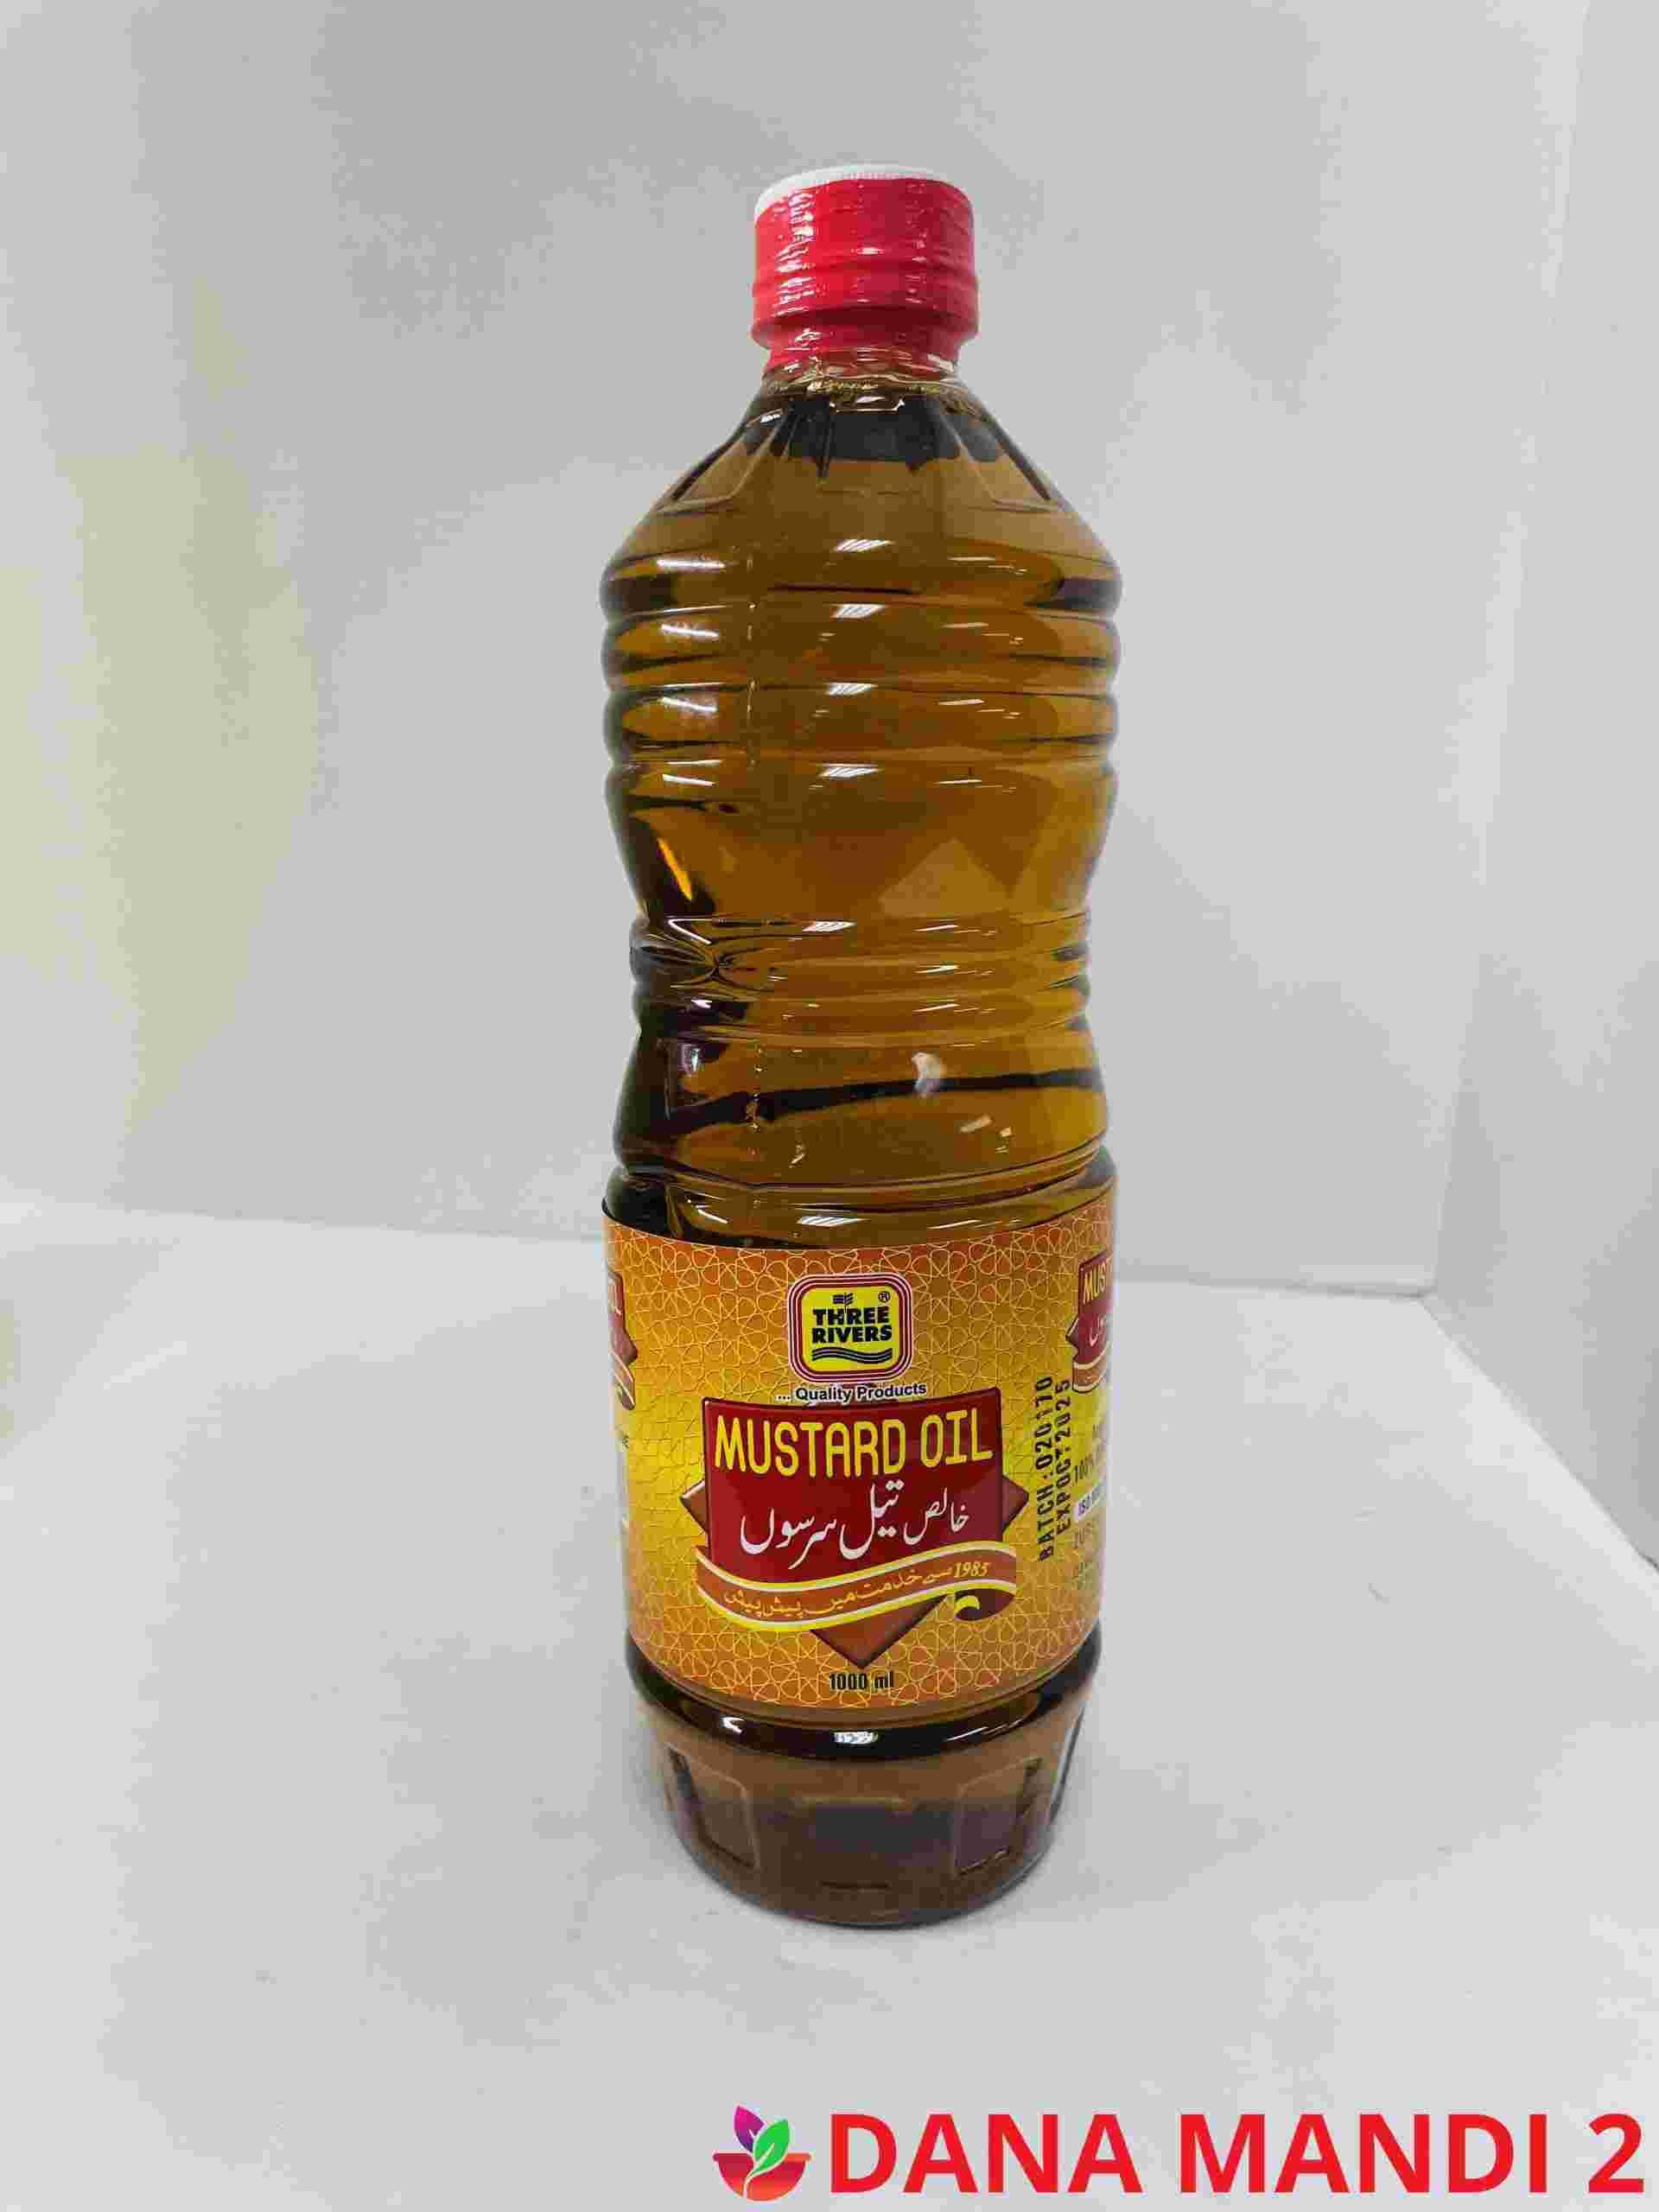 THREE RIVER Mustard Oil